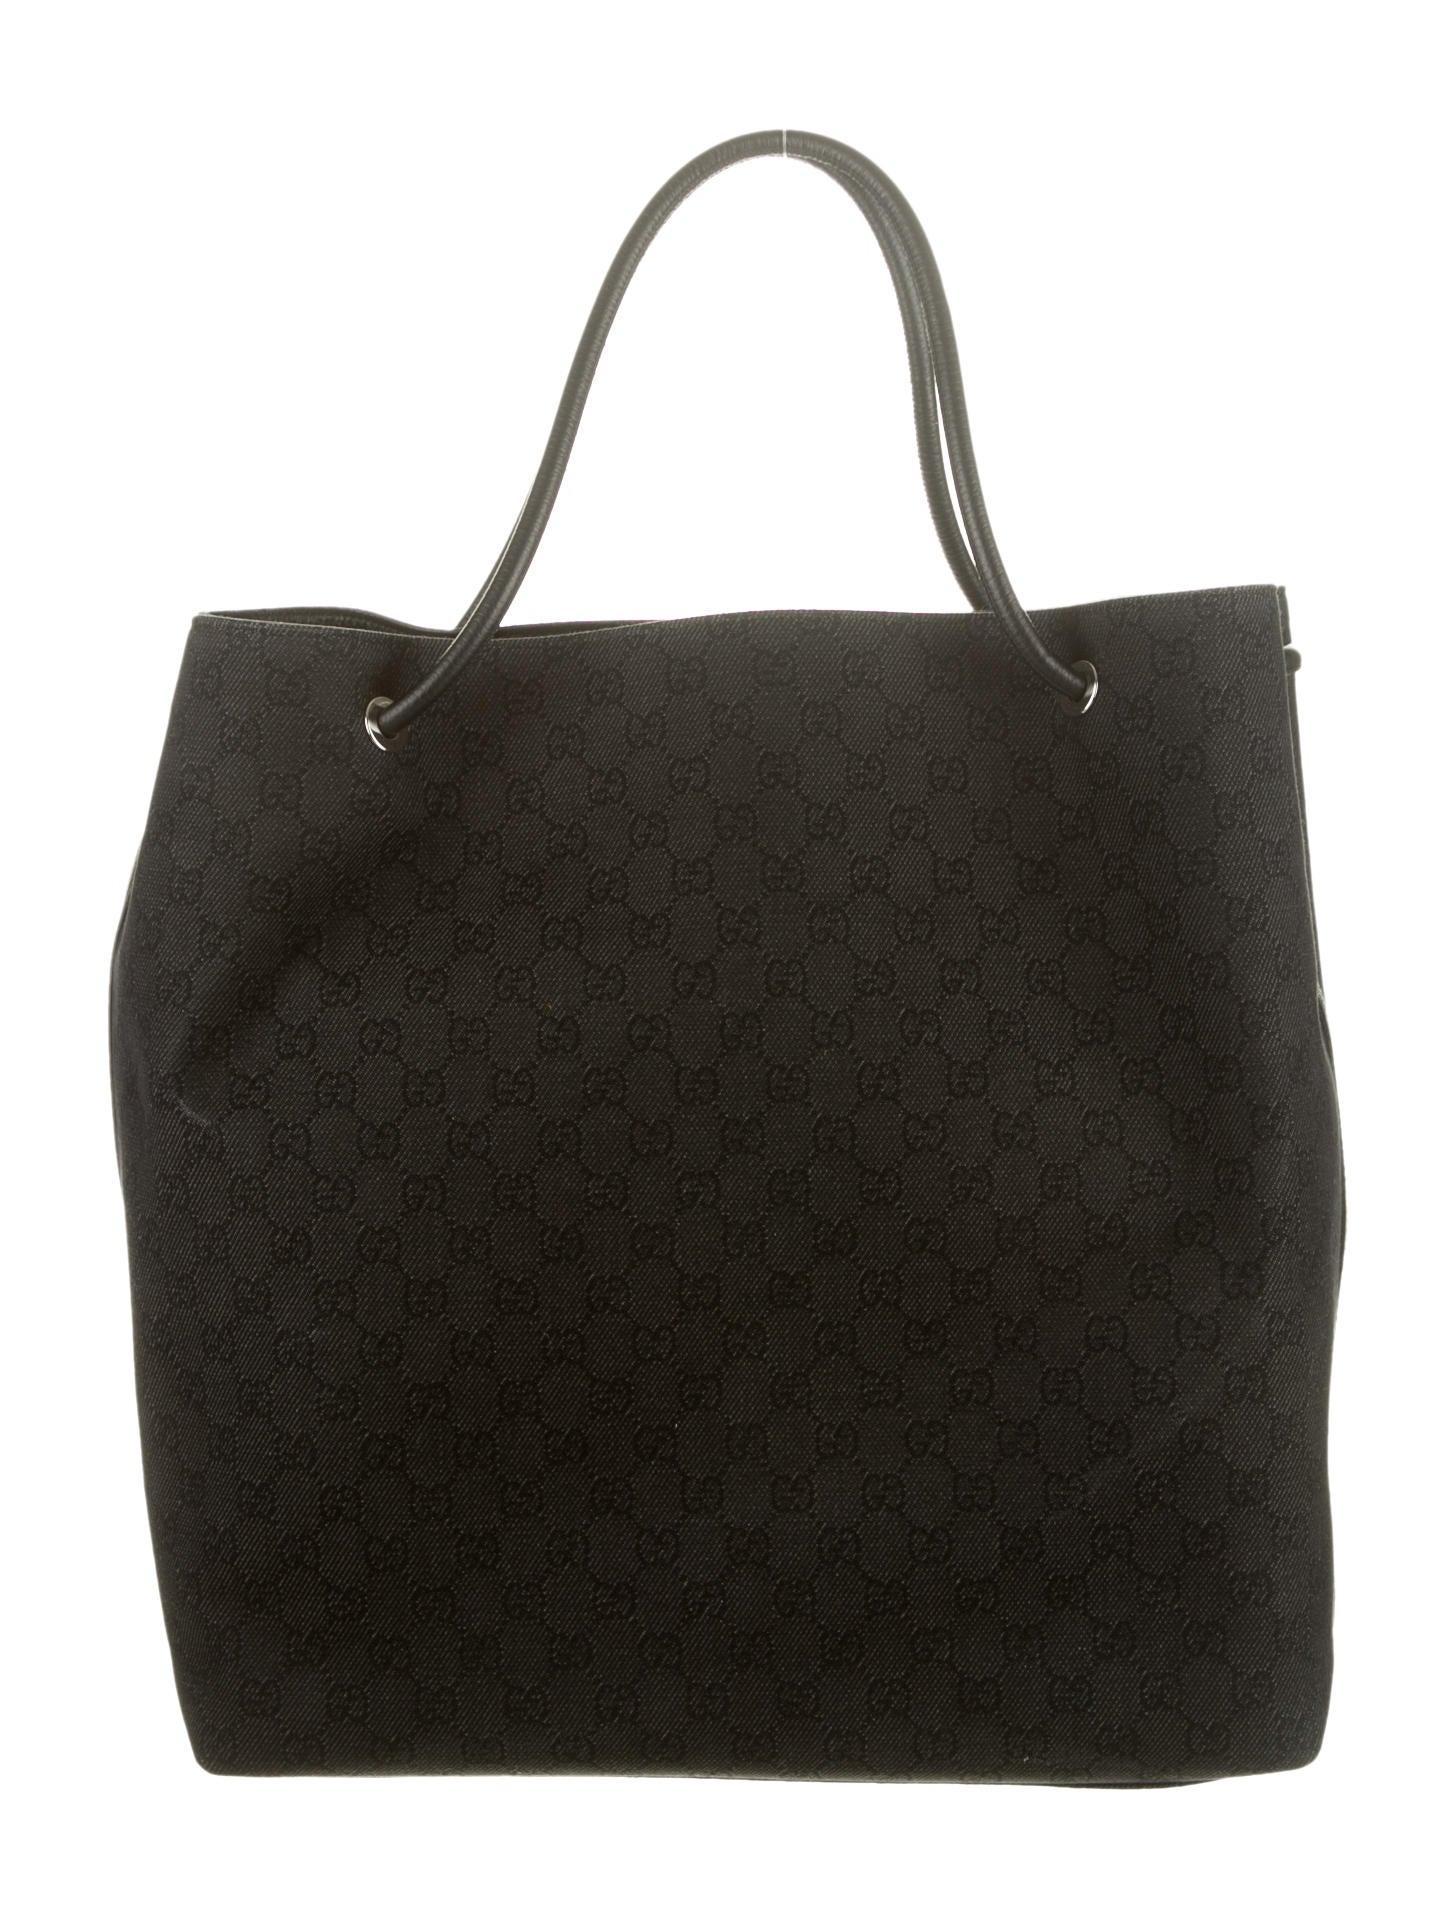 3e4d8254208 Gucci Large Gifford Tote - Handbags - GUC48285   The RealReal